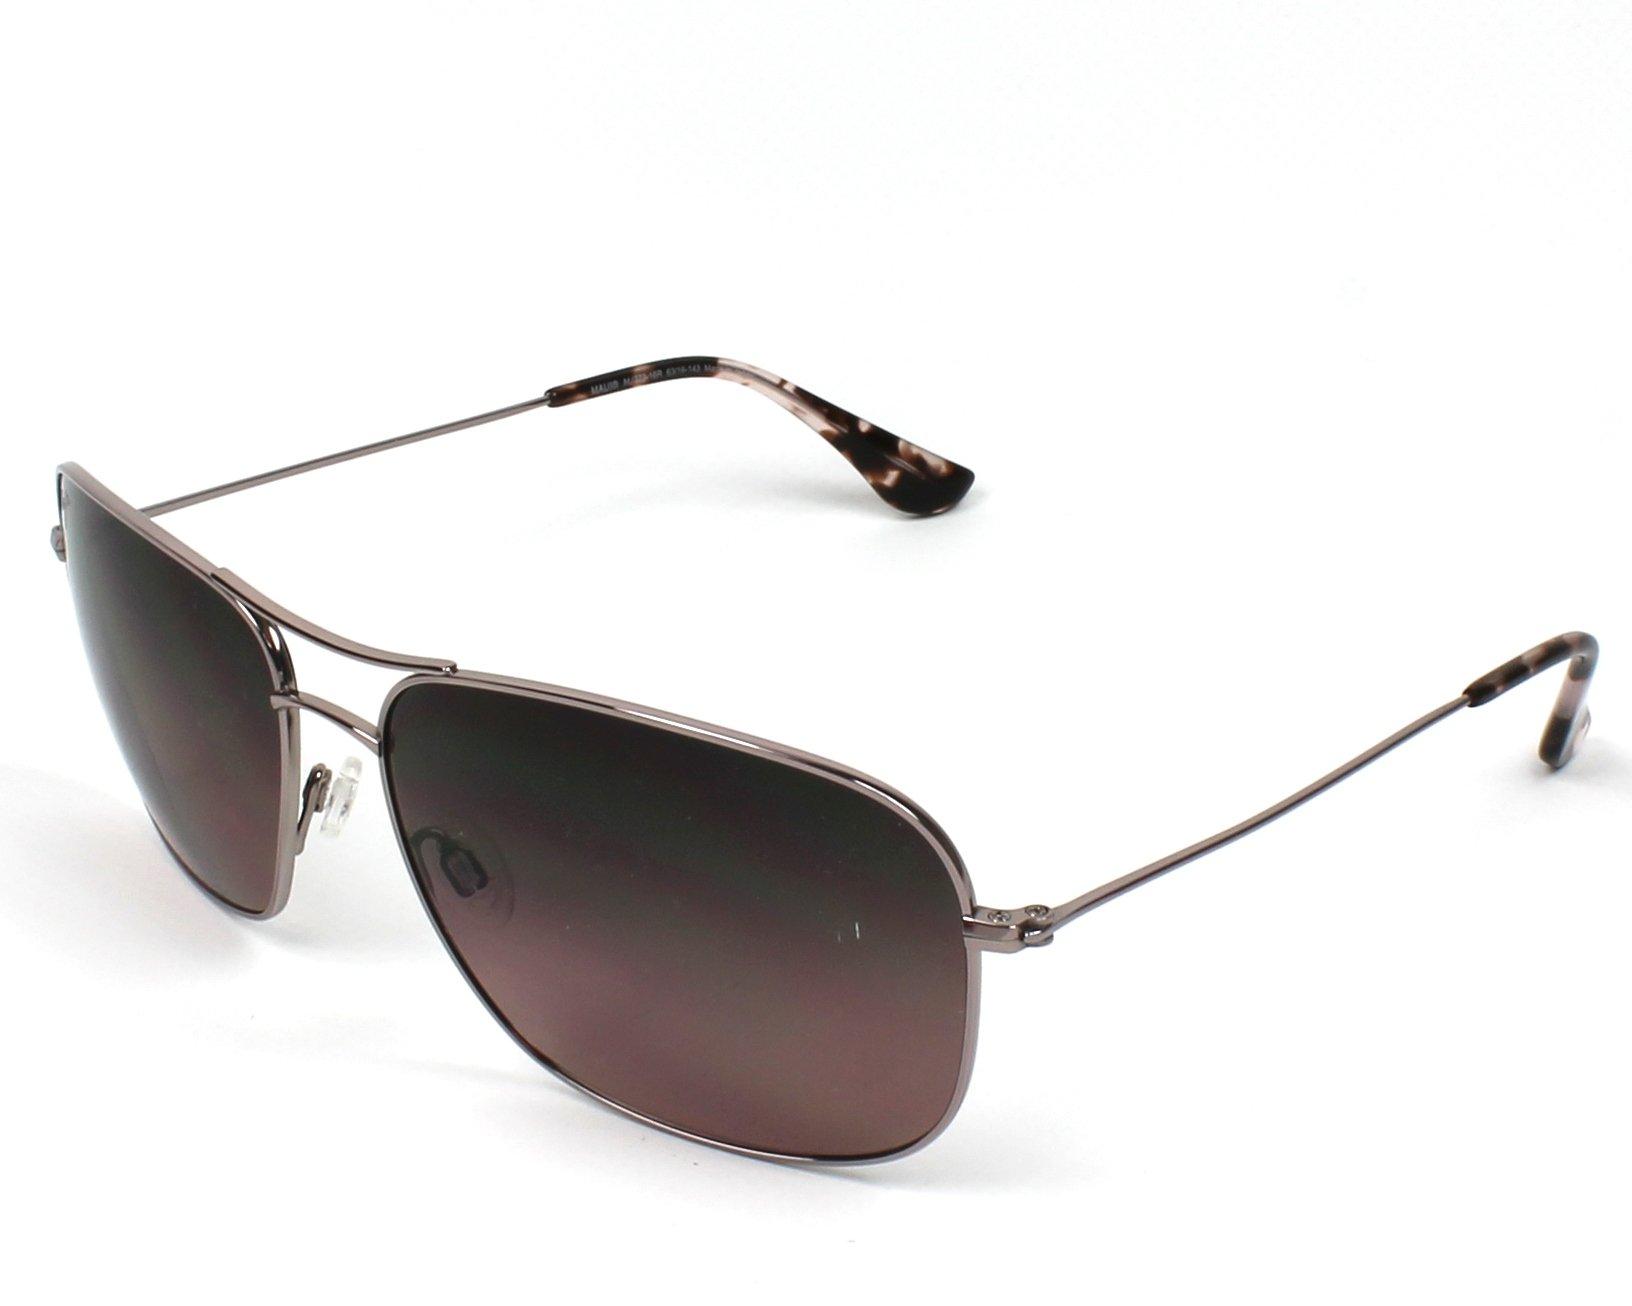 a3886cd3676 Polarized. Sunglasses Maui Jim RS-773 16R - Silver profile view